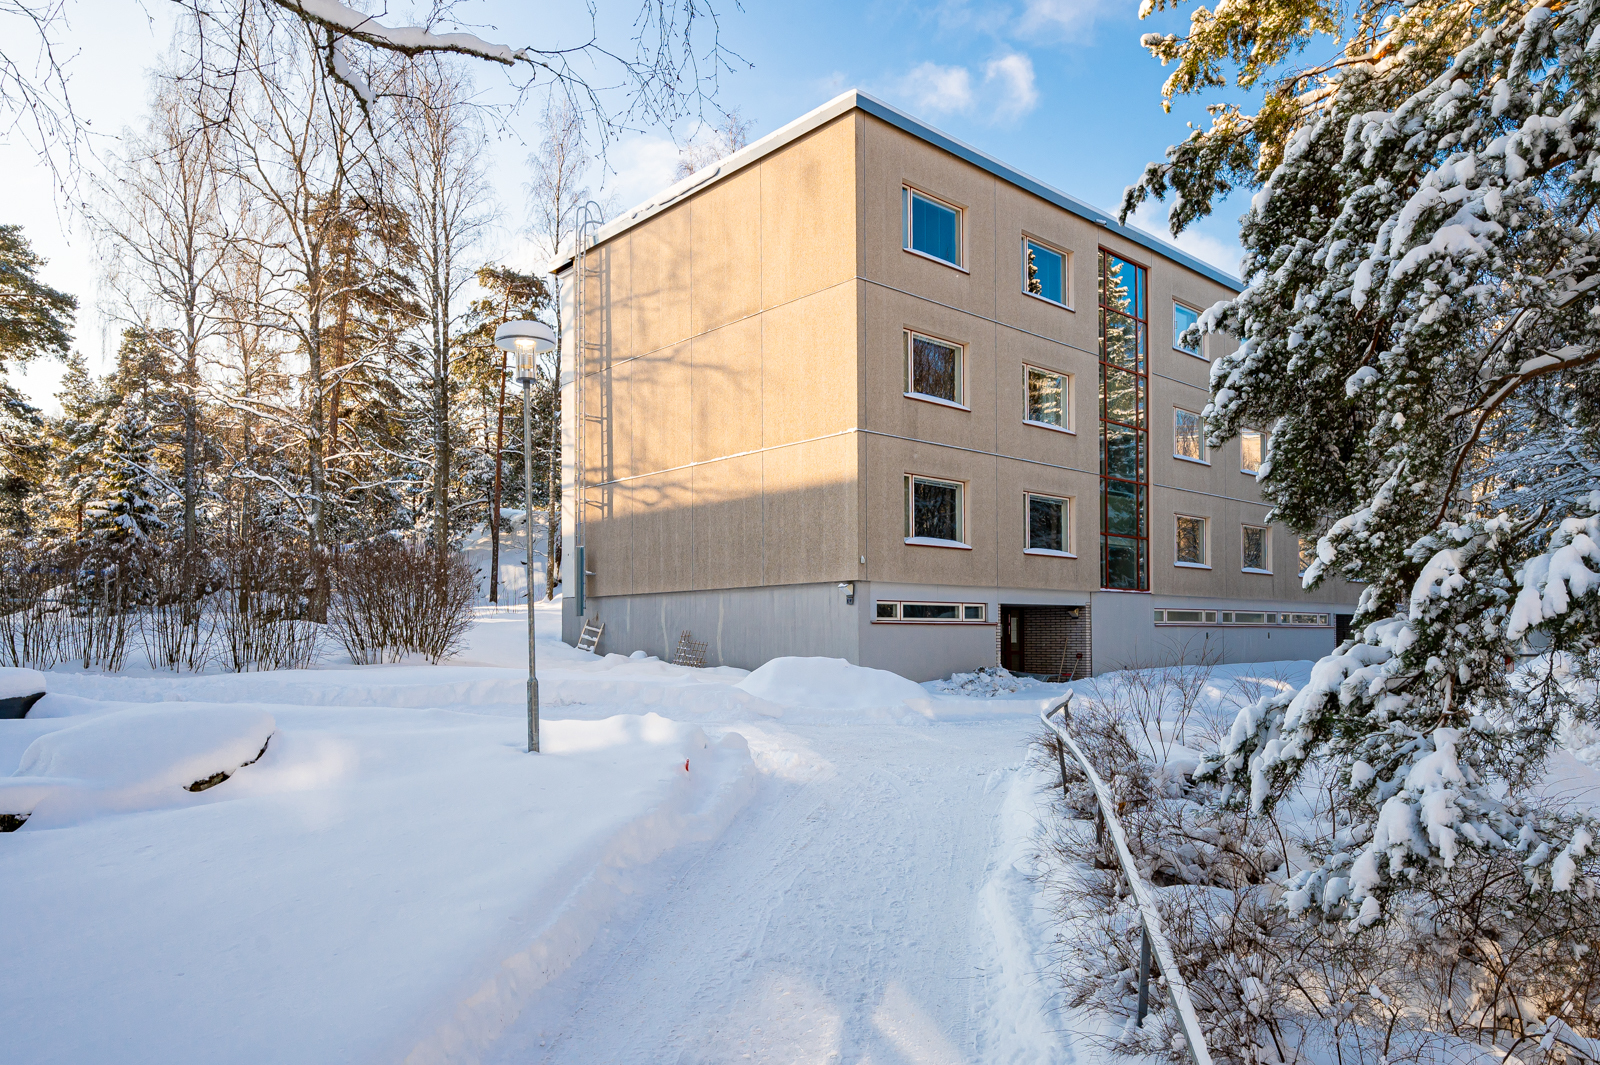 Mellunmäki, Helsinki